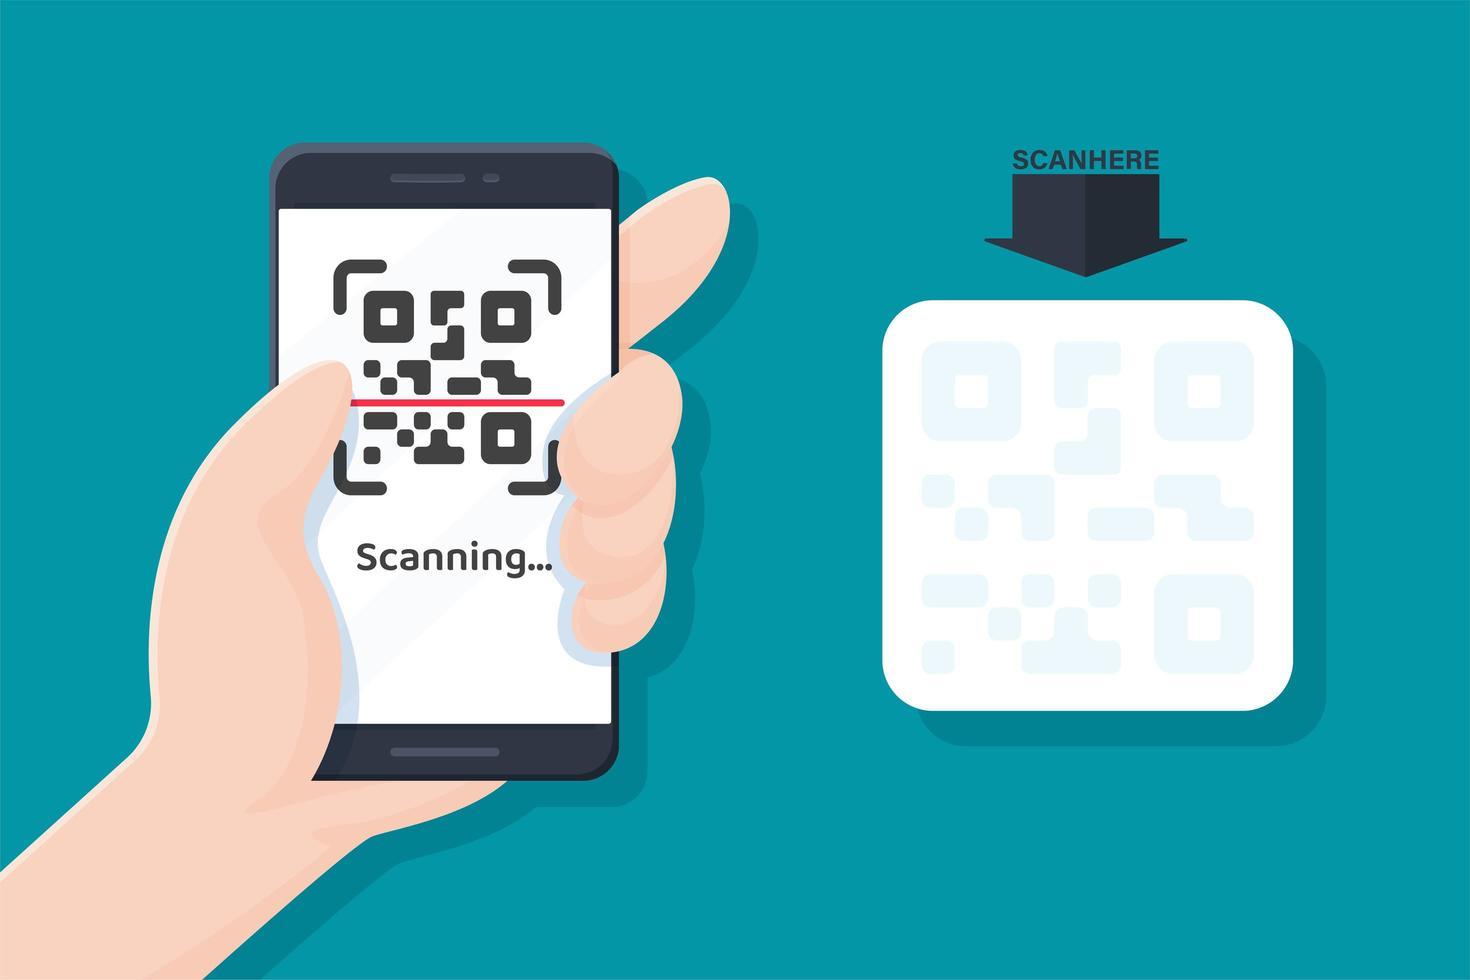 Mobile Phone Scanning QR Code vector